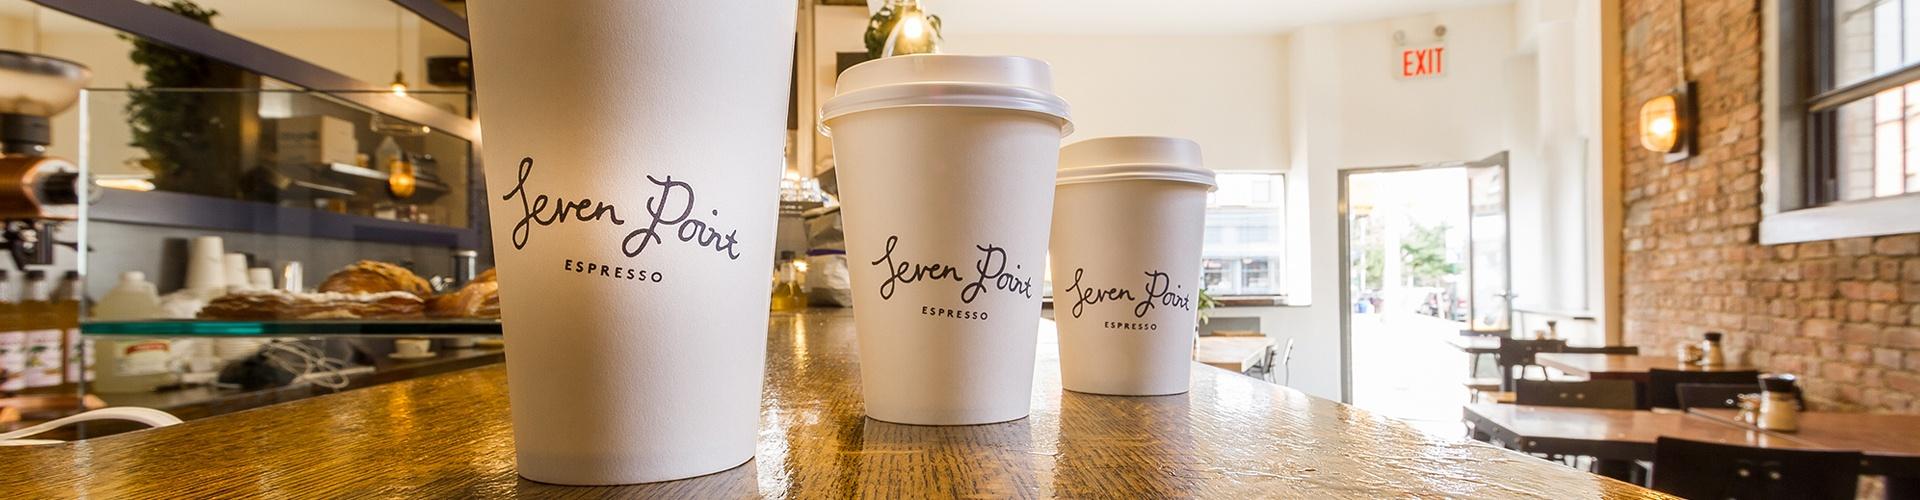 The Renovation: Seven Point Espresso – Australian Coffee comes to Brooklyn